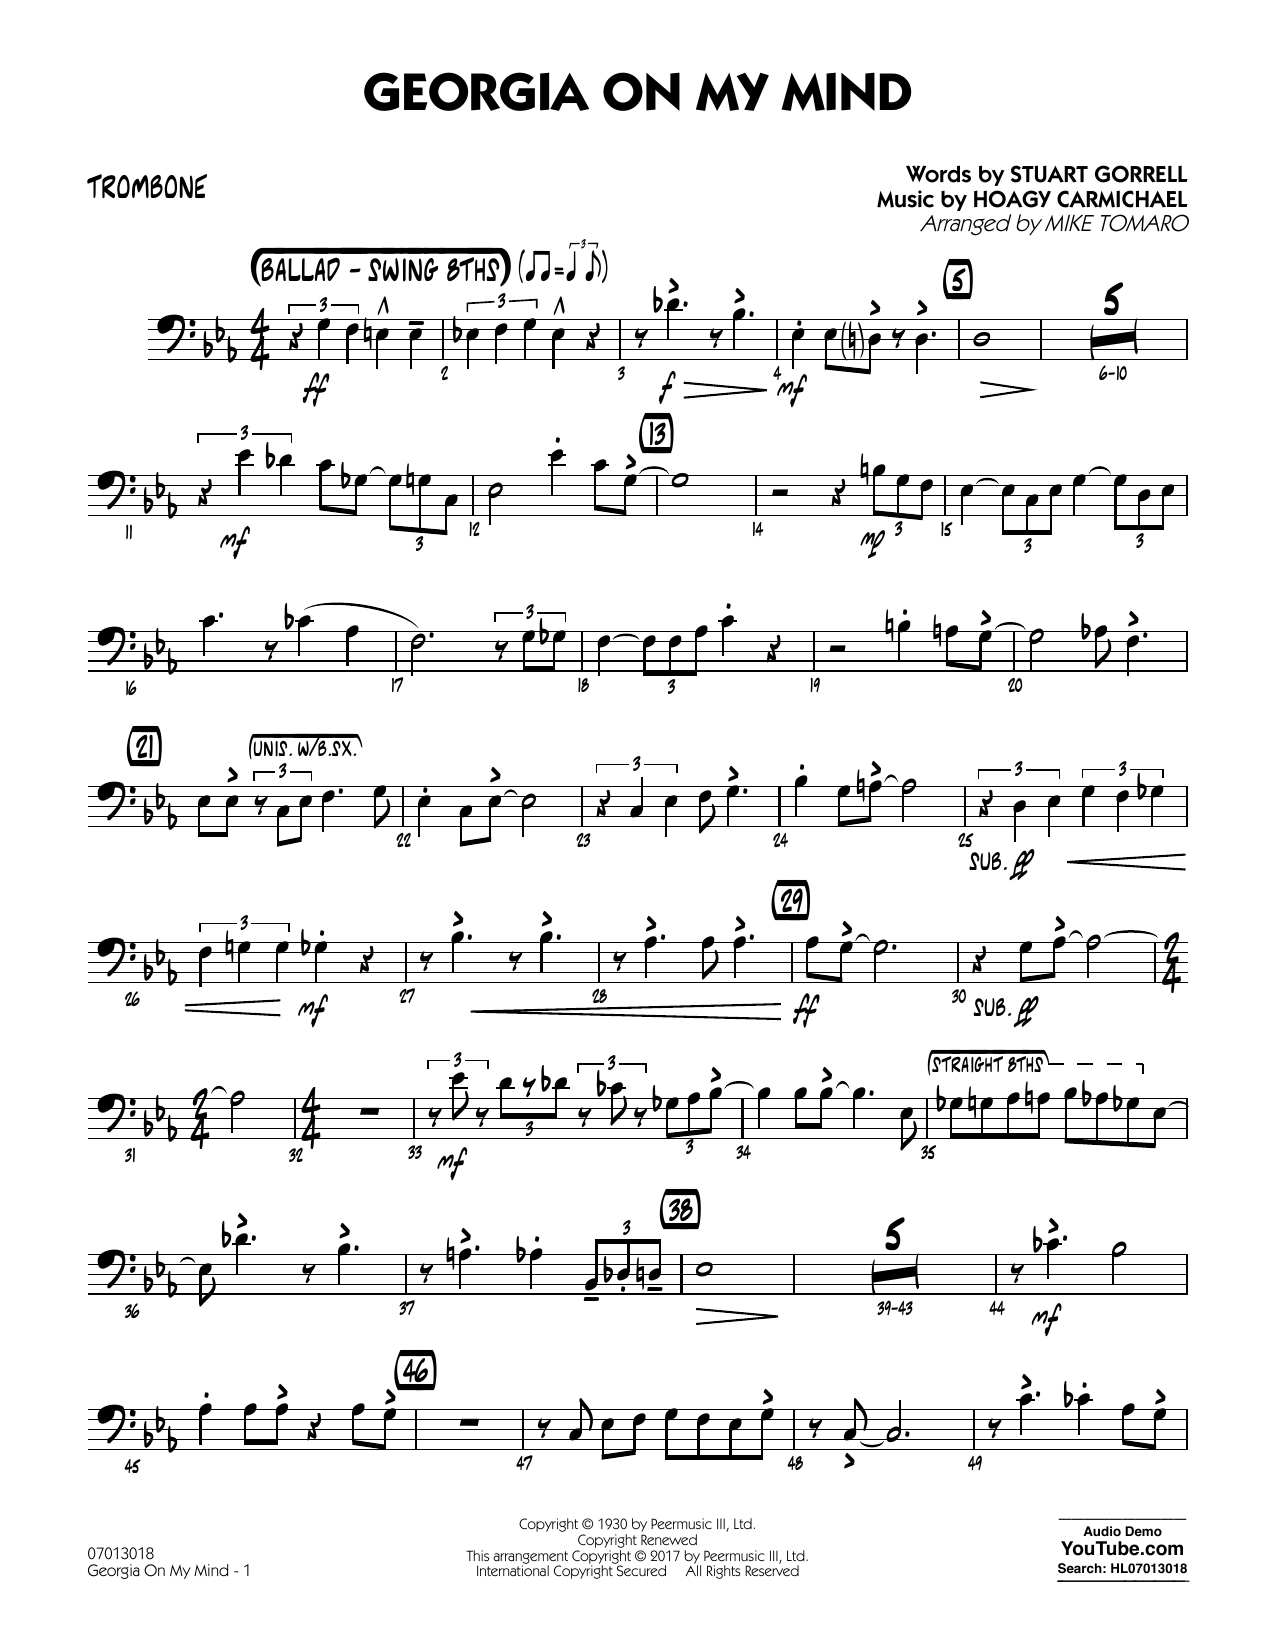 Georgia on my mind trombone sheet music at stantons sheet music format jazz ensemble hexwebz Image collections